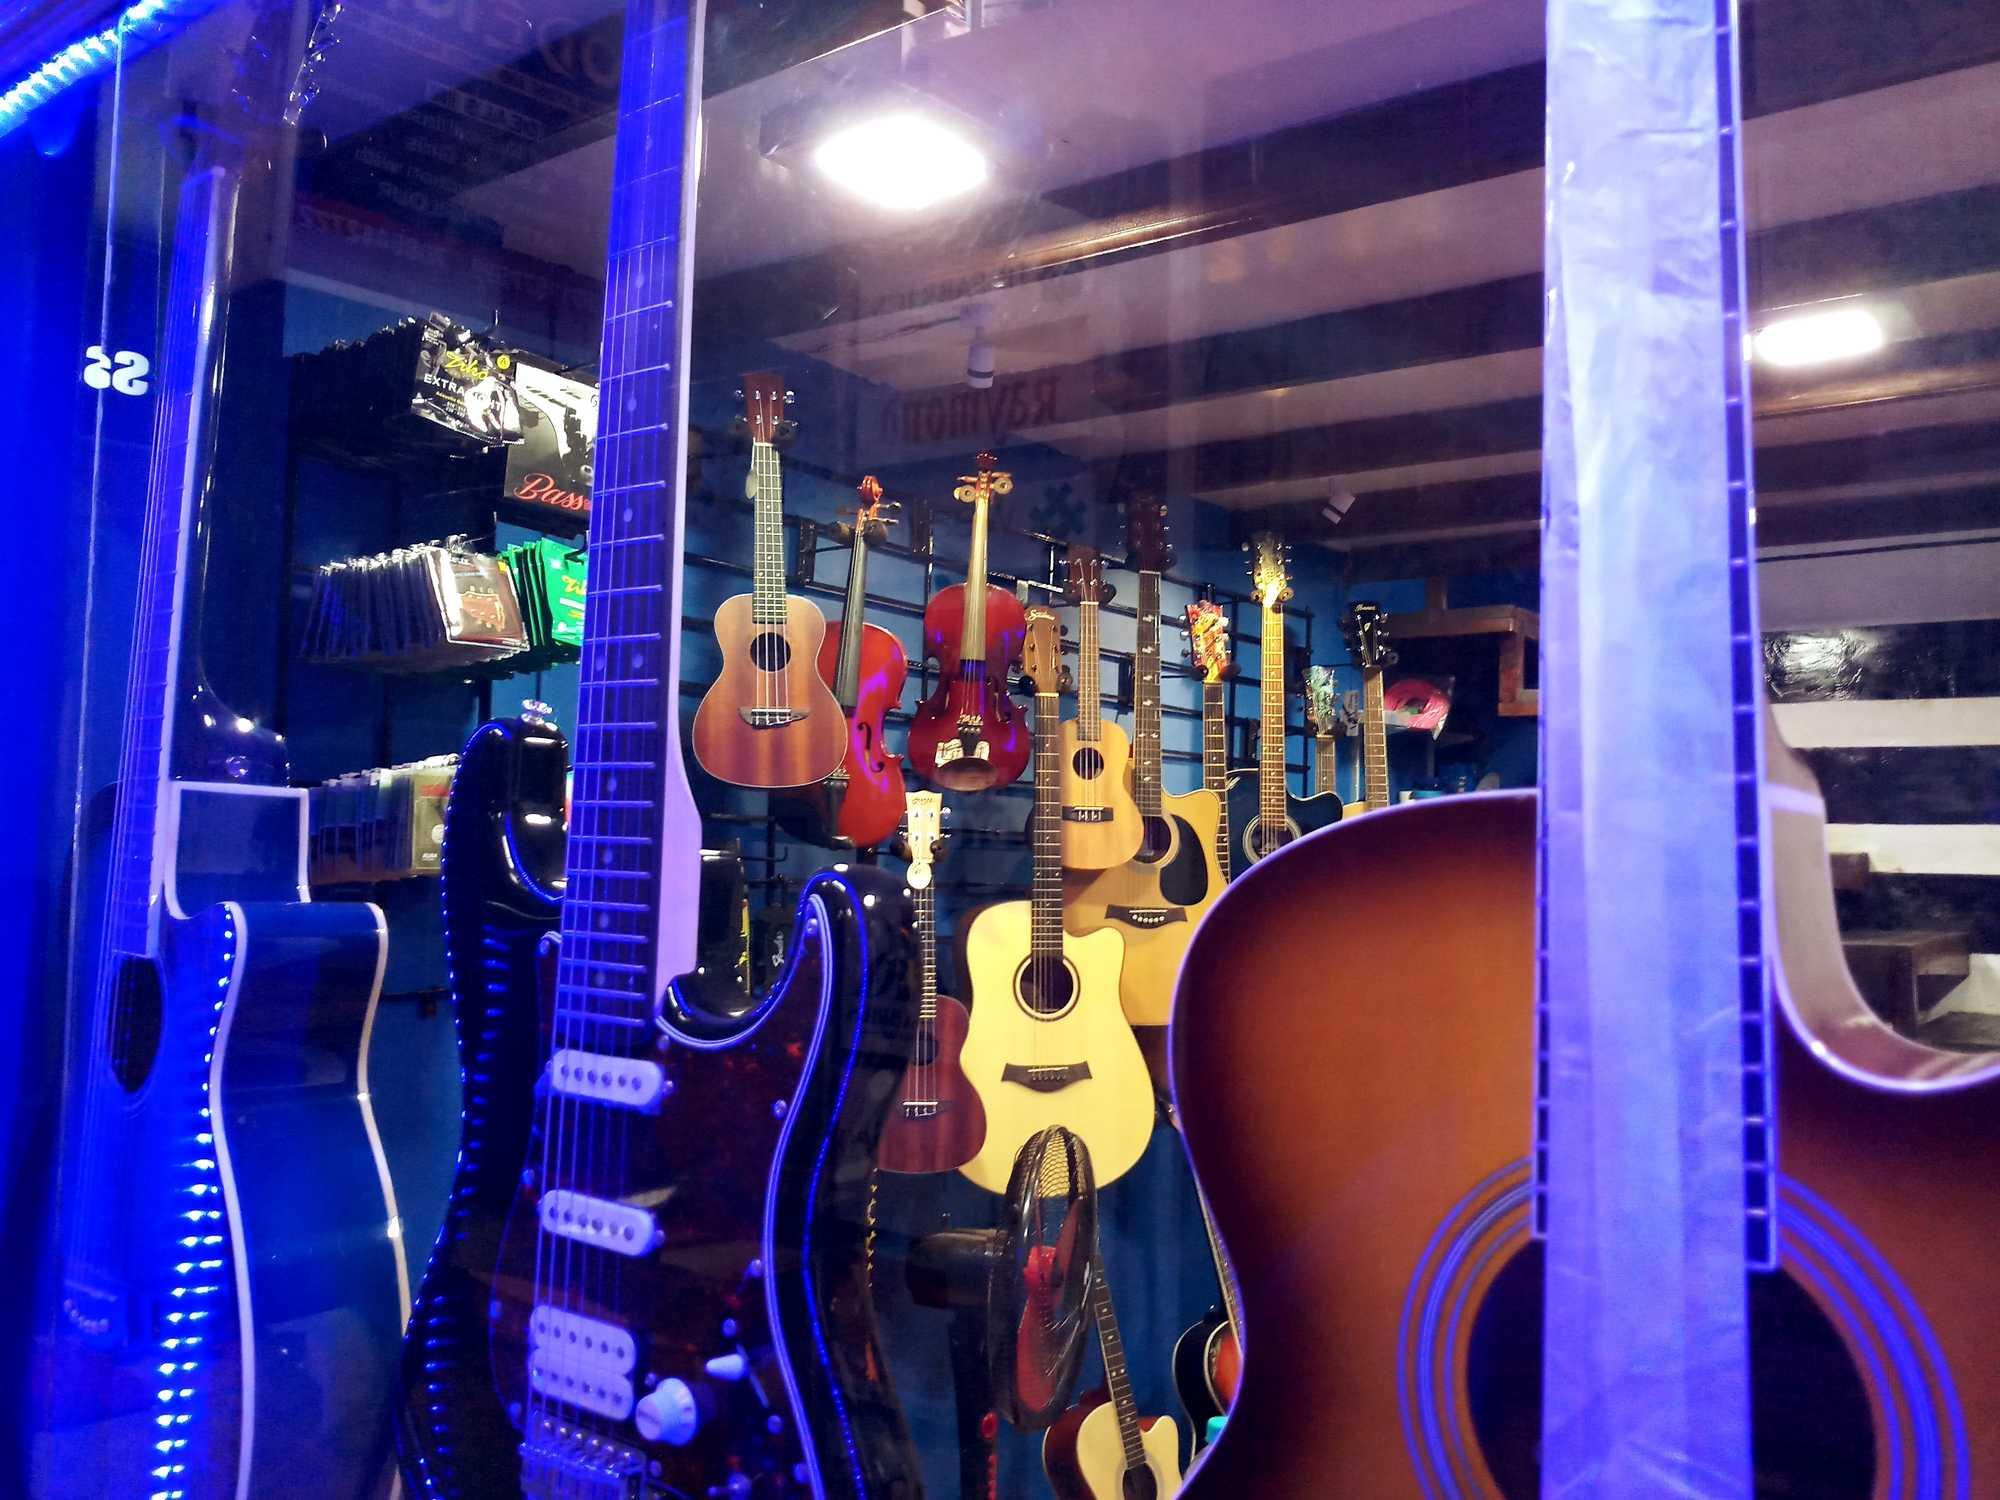 Top Boss Musical Instrument Dealers in Duliajan - Best Boss Musical